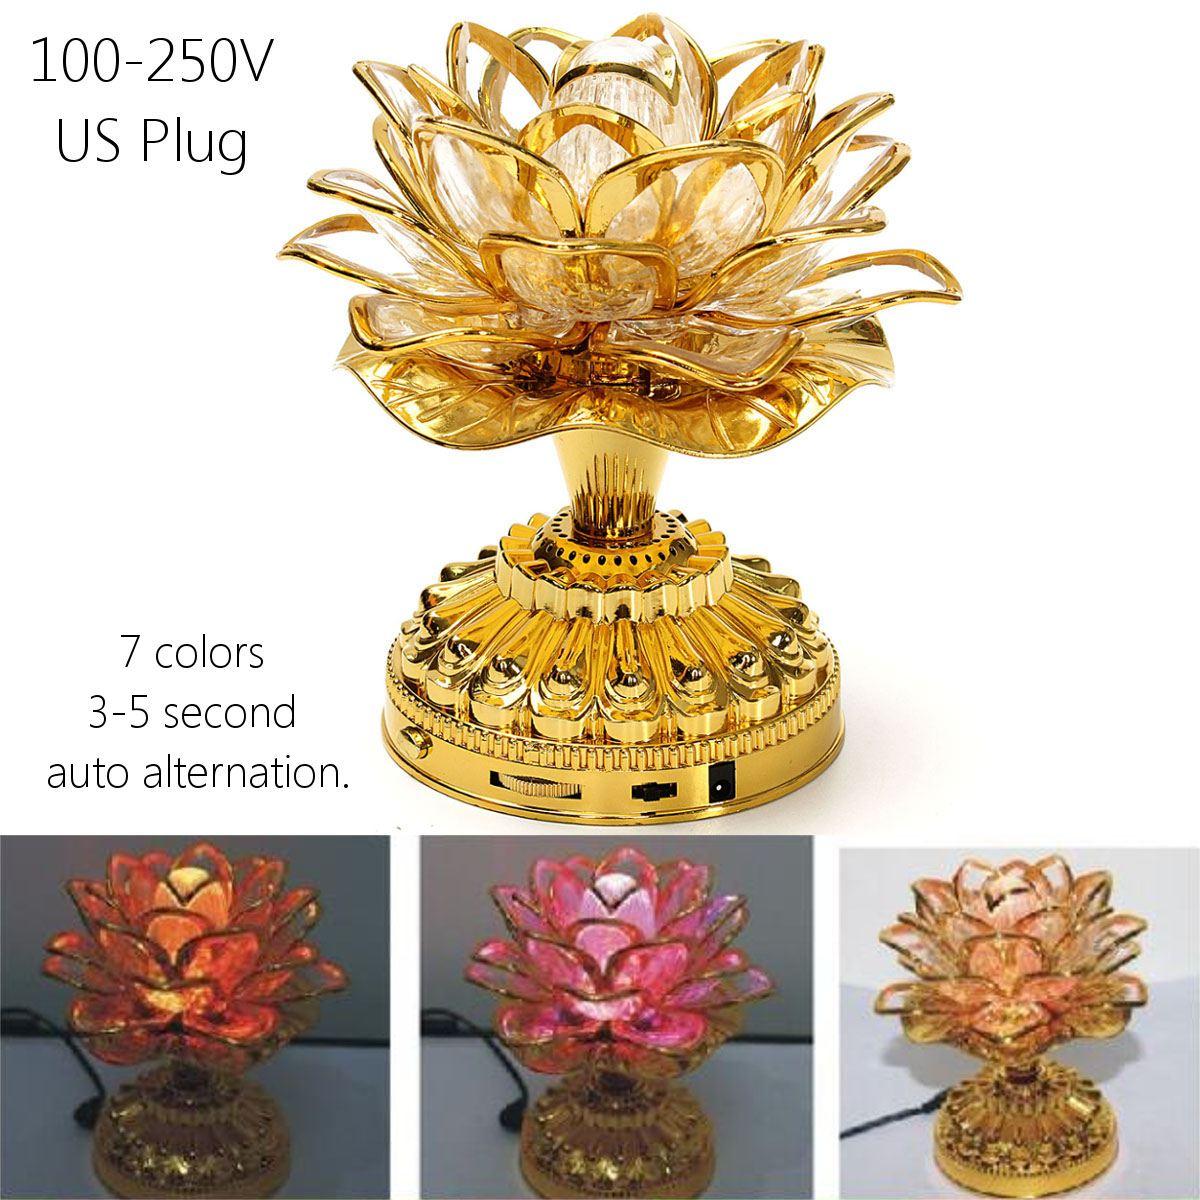 Colorful LED Lotus Buddhist Lamp Built 36 Buddhist Songs With US Plug  110-250 V  Buddha Lotus Light Buddhist Supplies